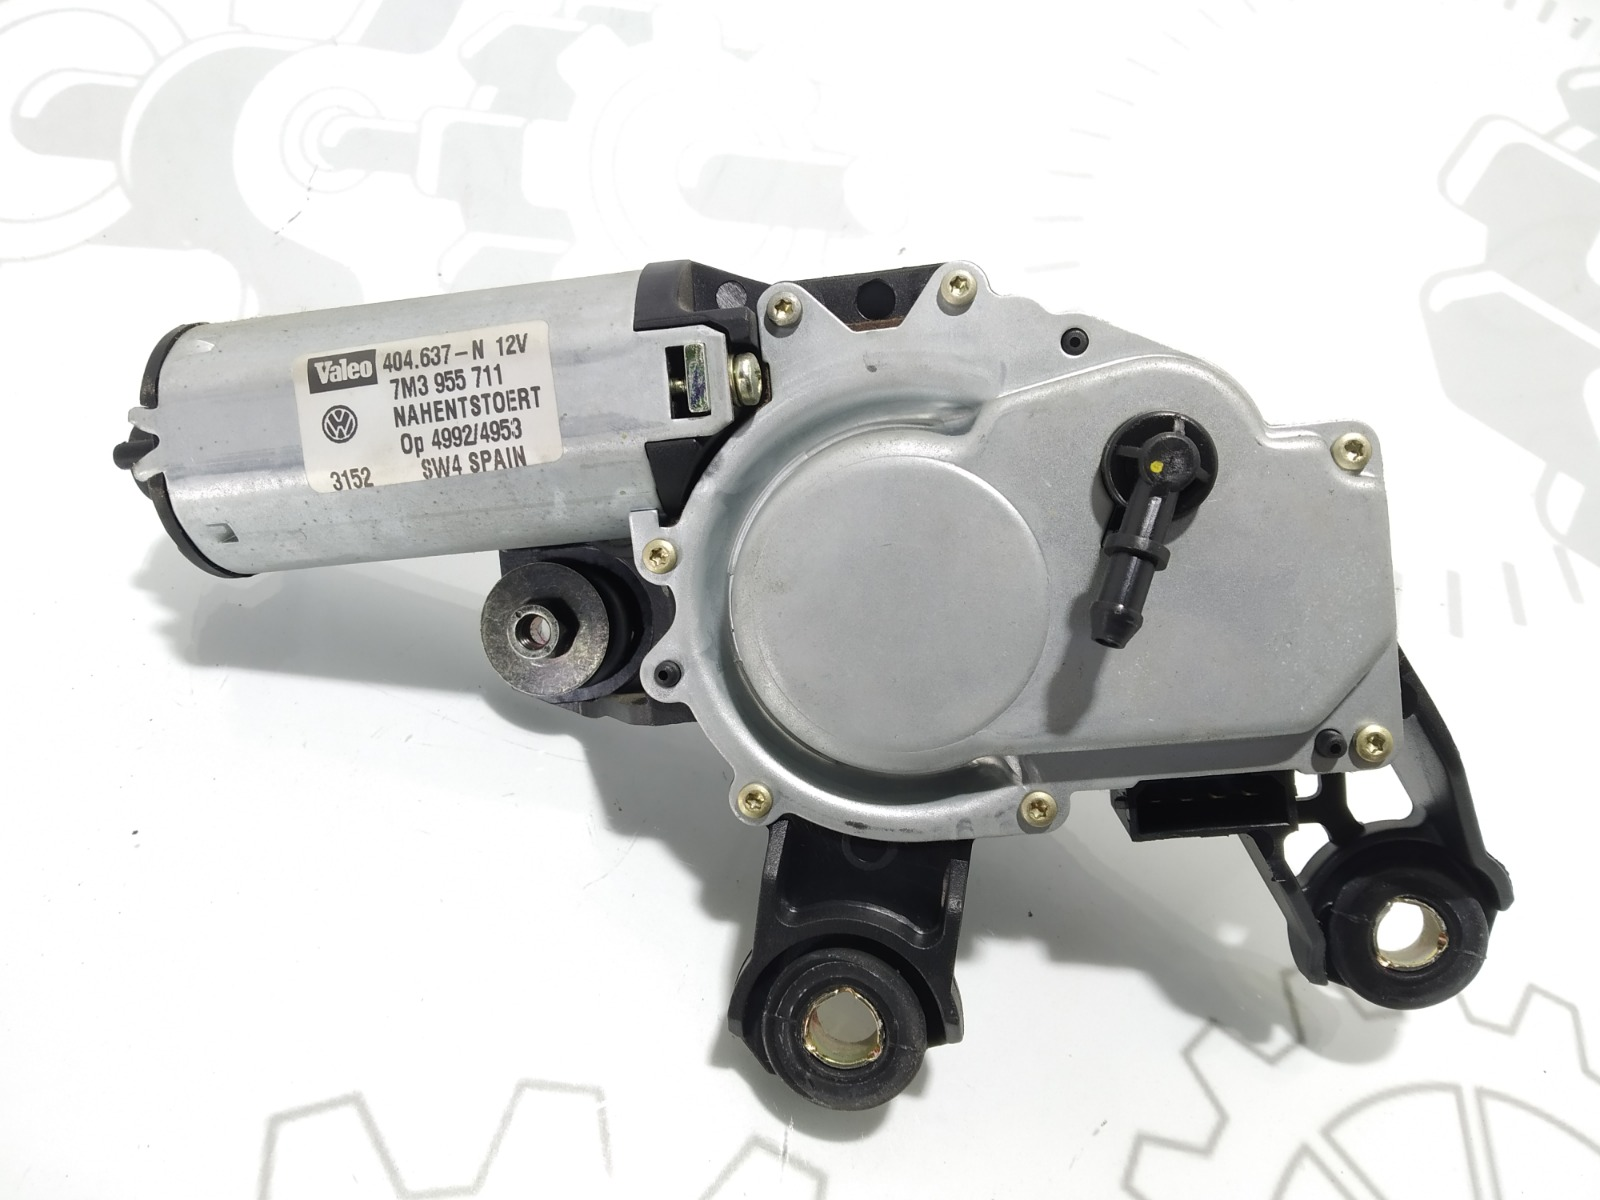 Моторчик заднего стеклоочистителя (дворника) Seat Alhambra 1.9 TDI 2002 (б/у)